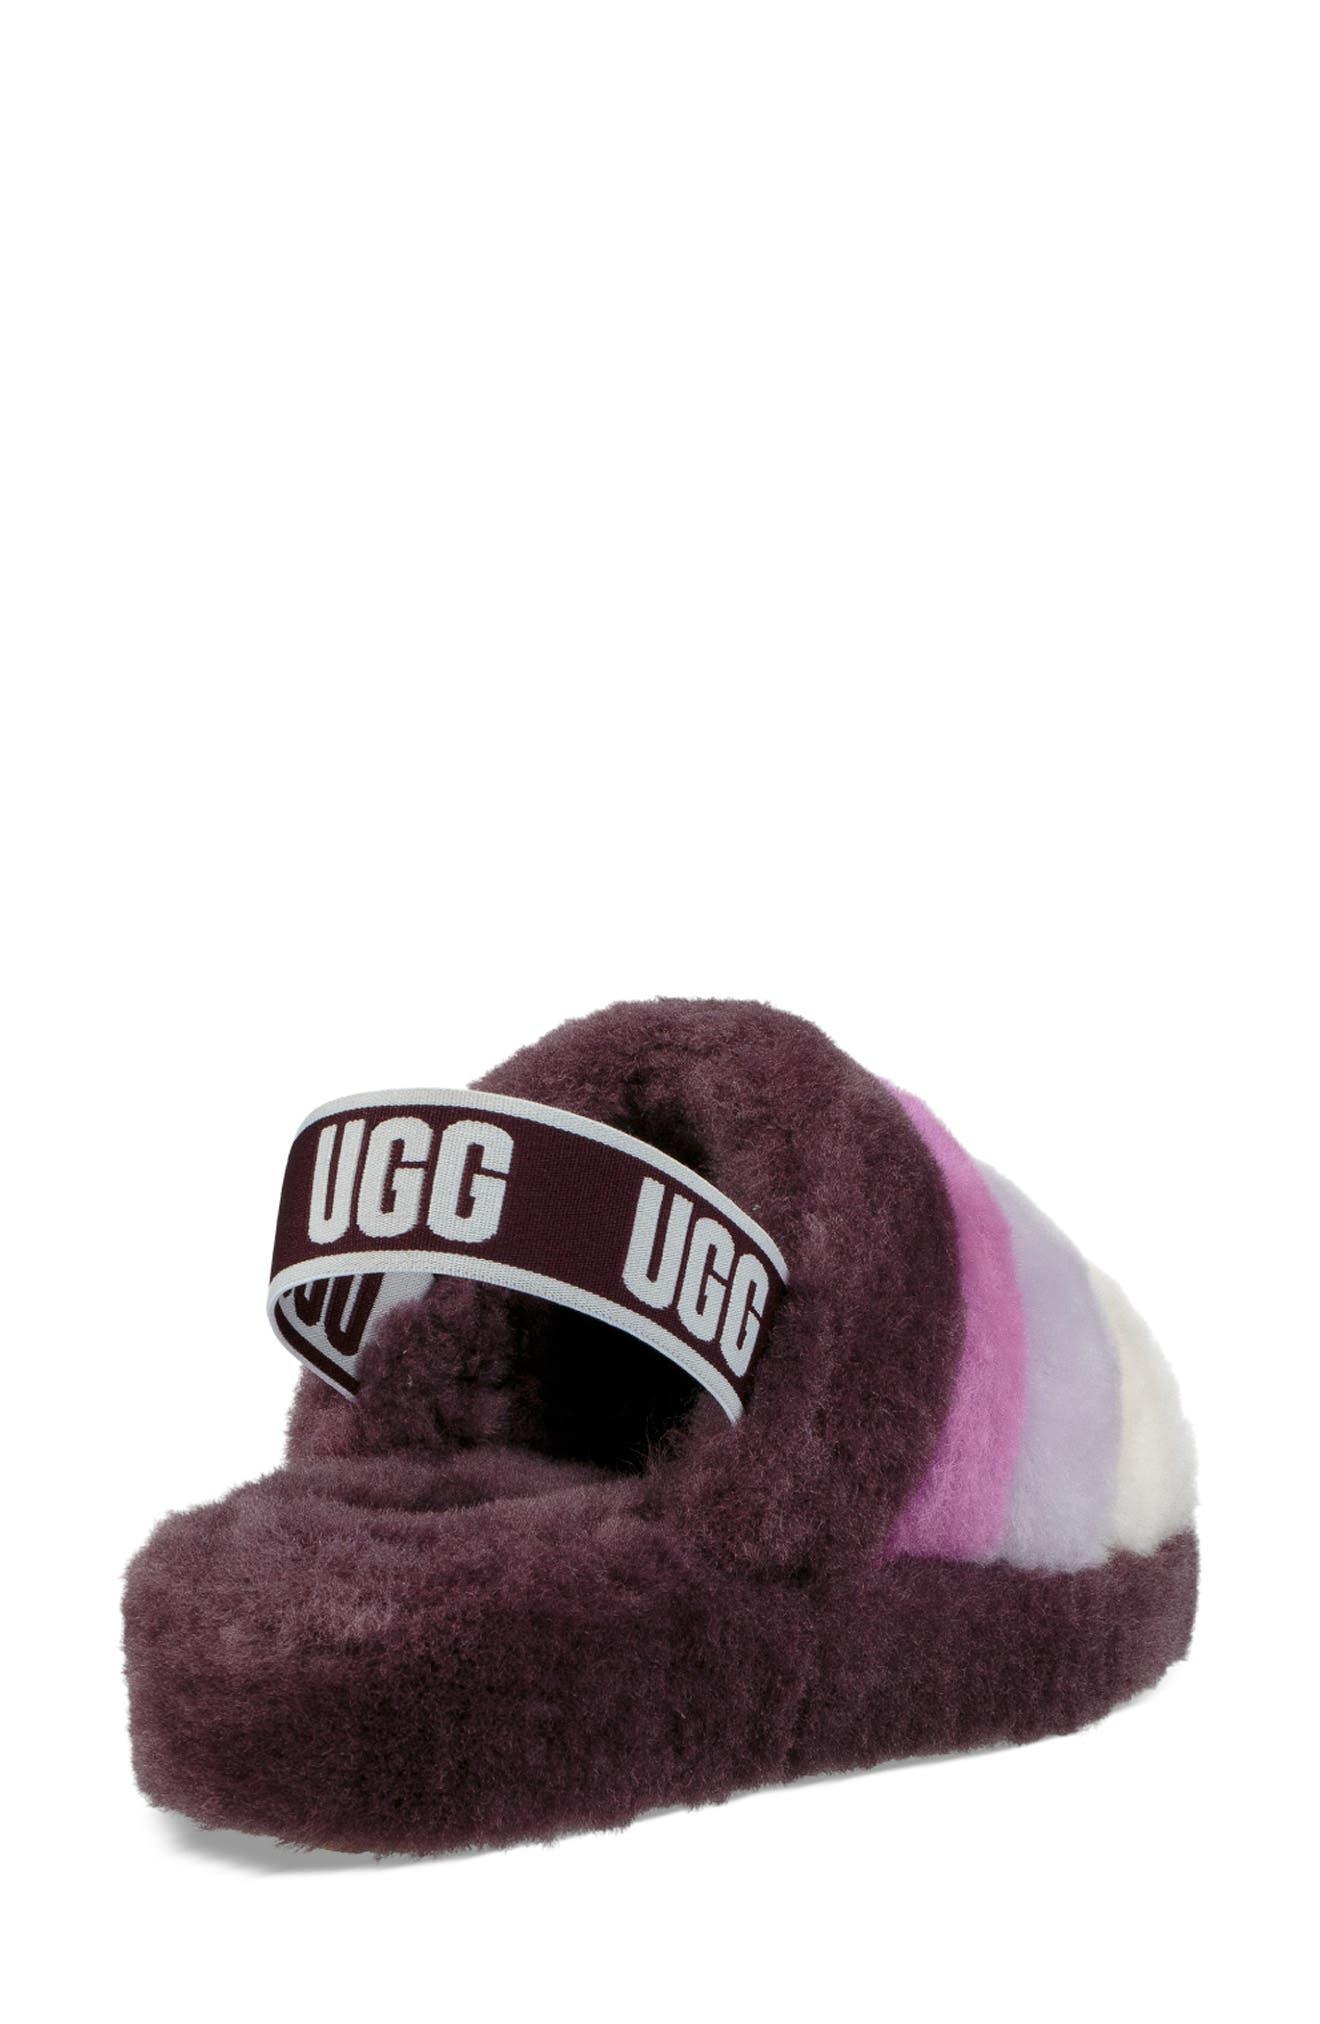 Ugg Fluff Yeah Genuine Shearling Slipper, Purple